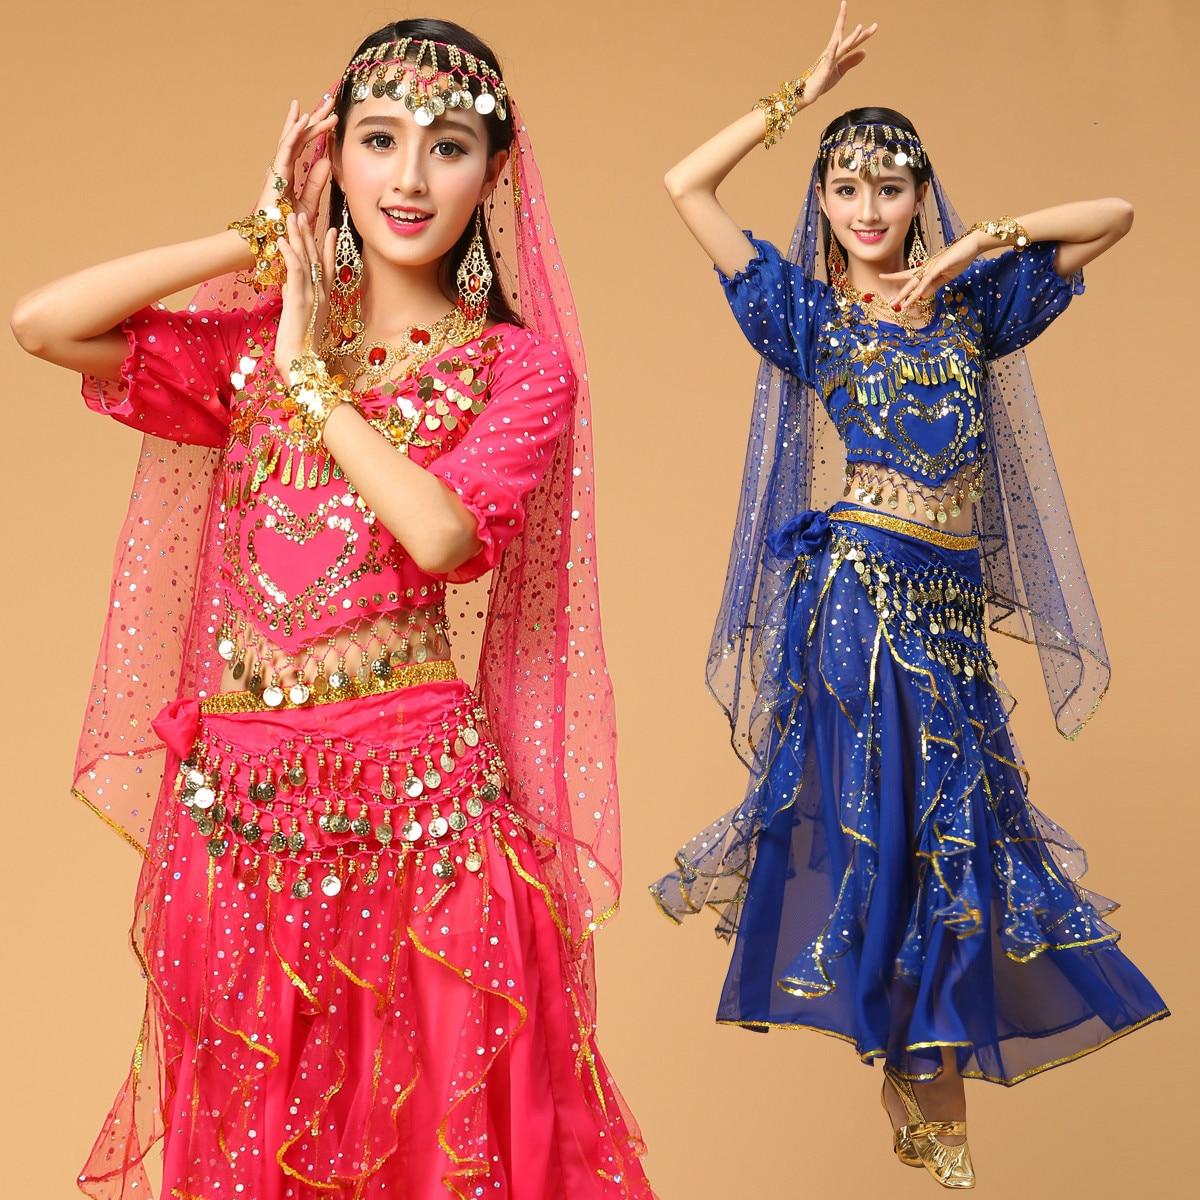 colorful hindu dancers in big costumes